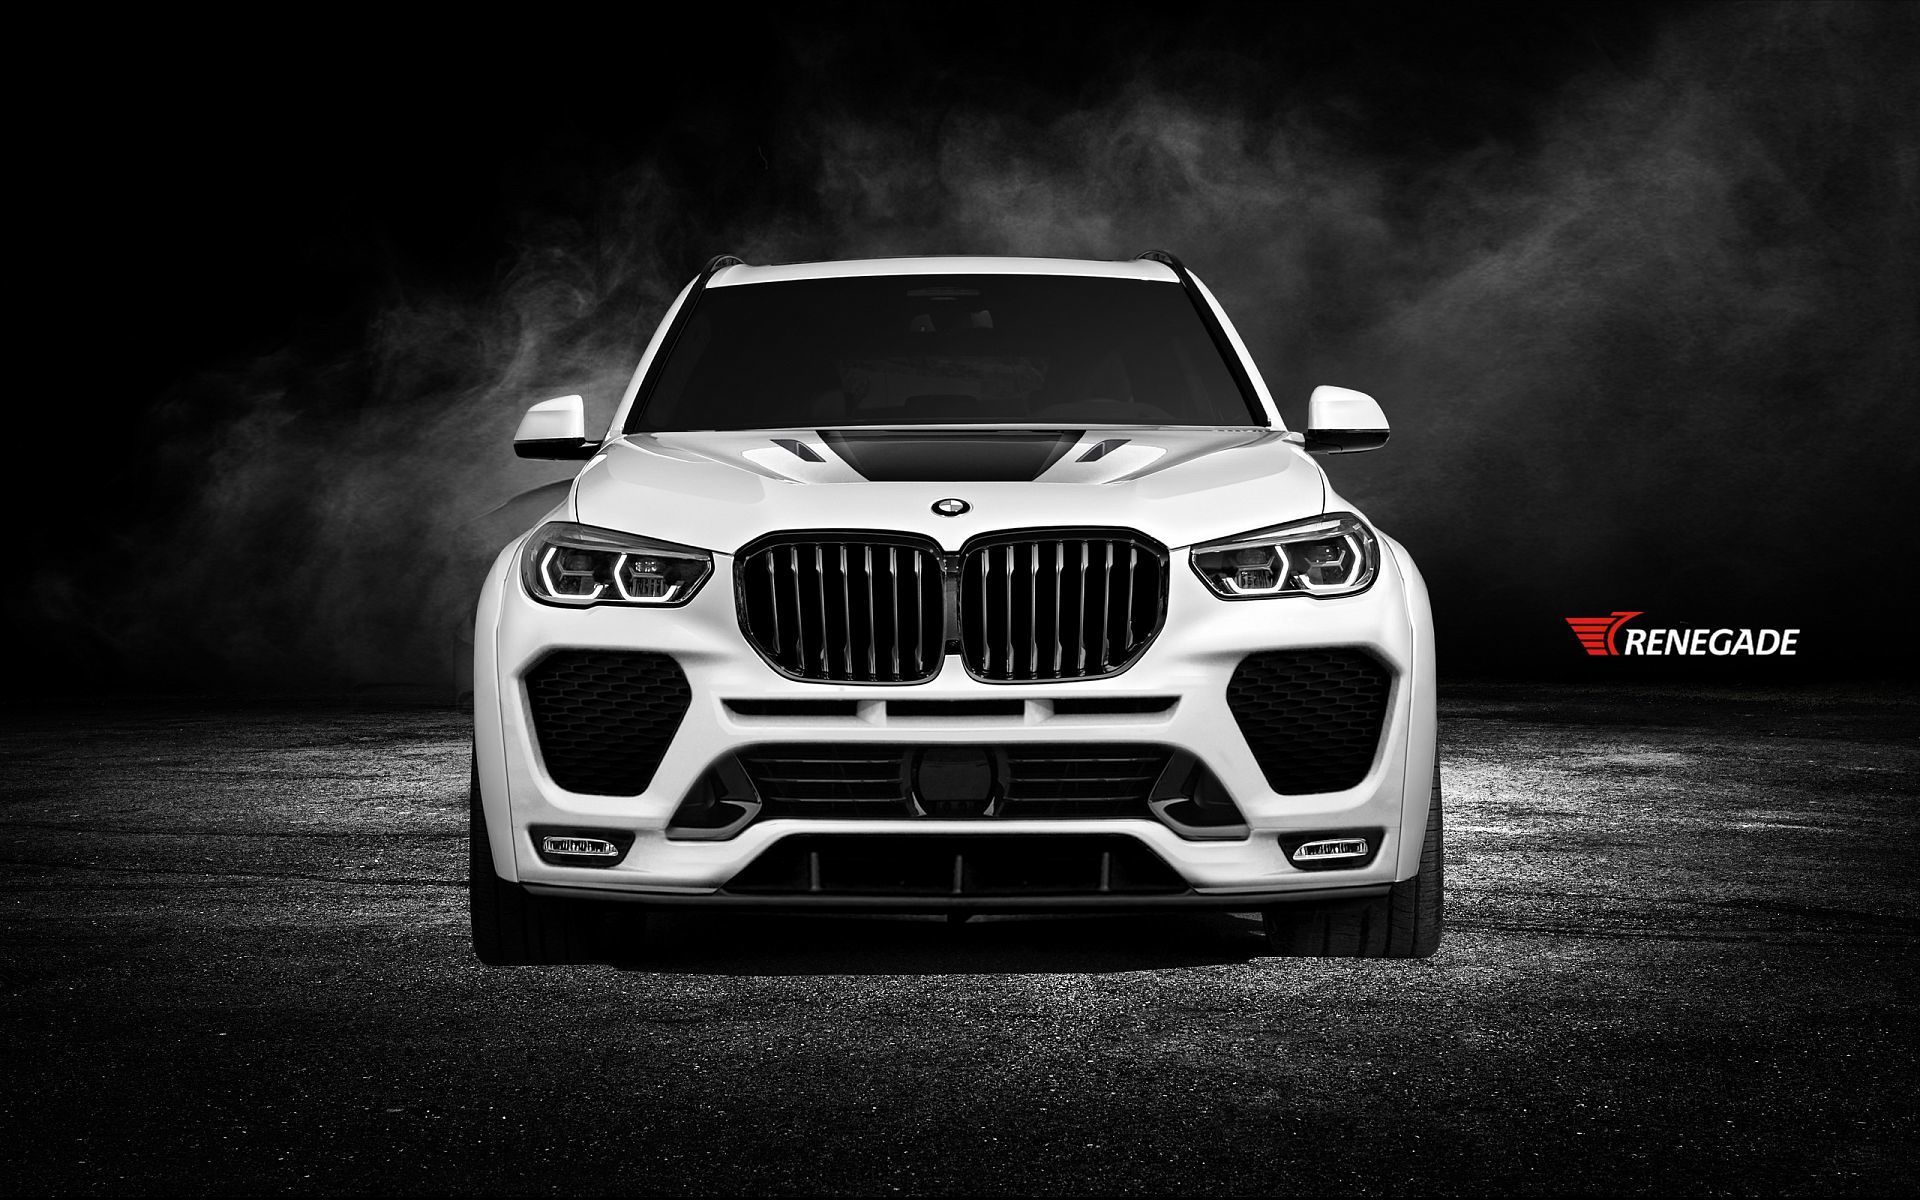 Renegade body kit for BMW X5 G05 carbon